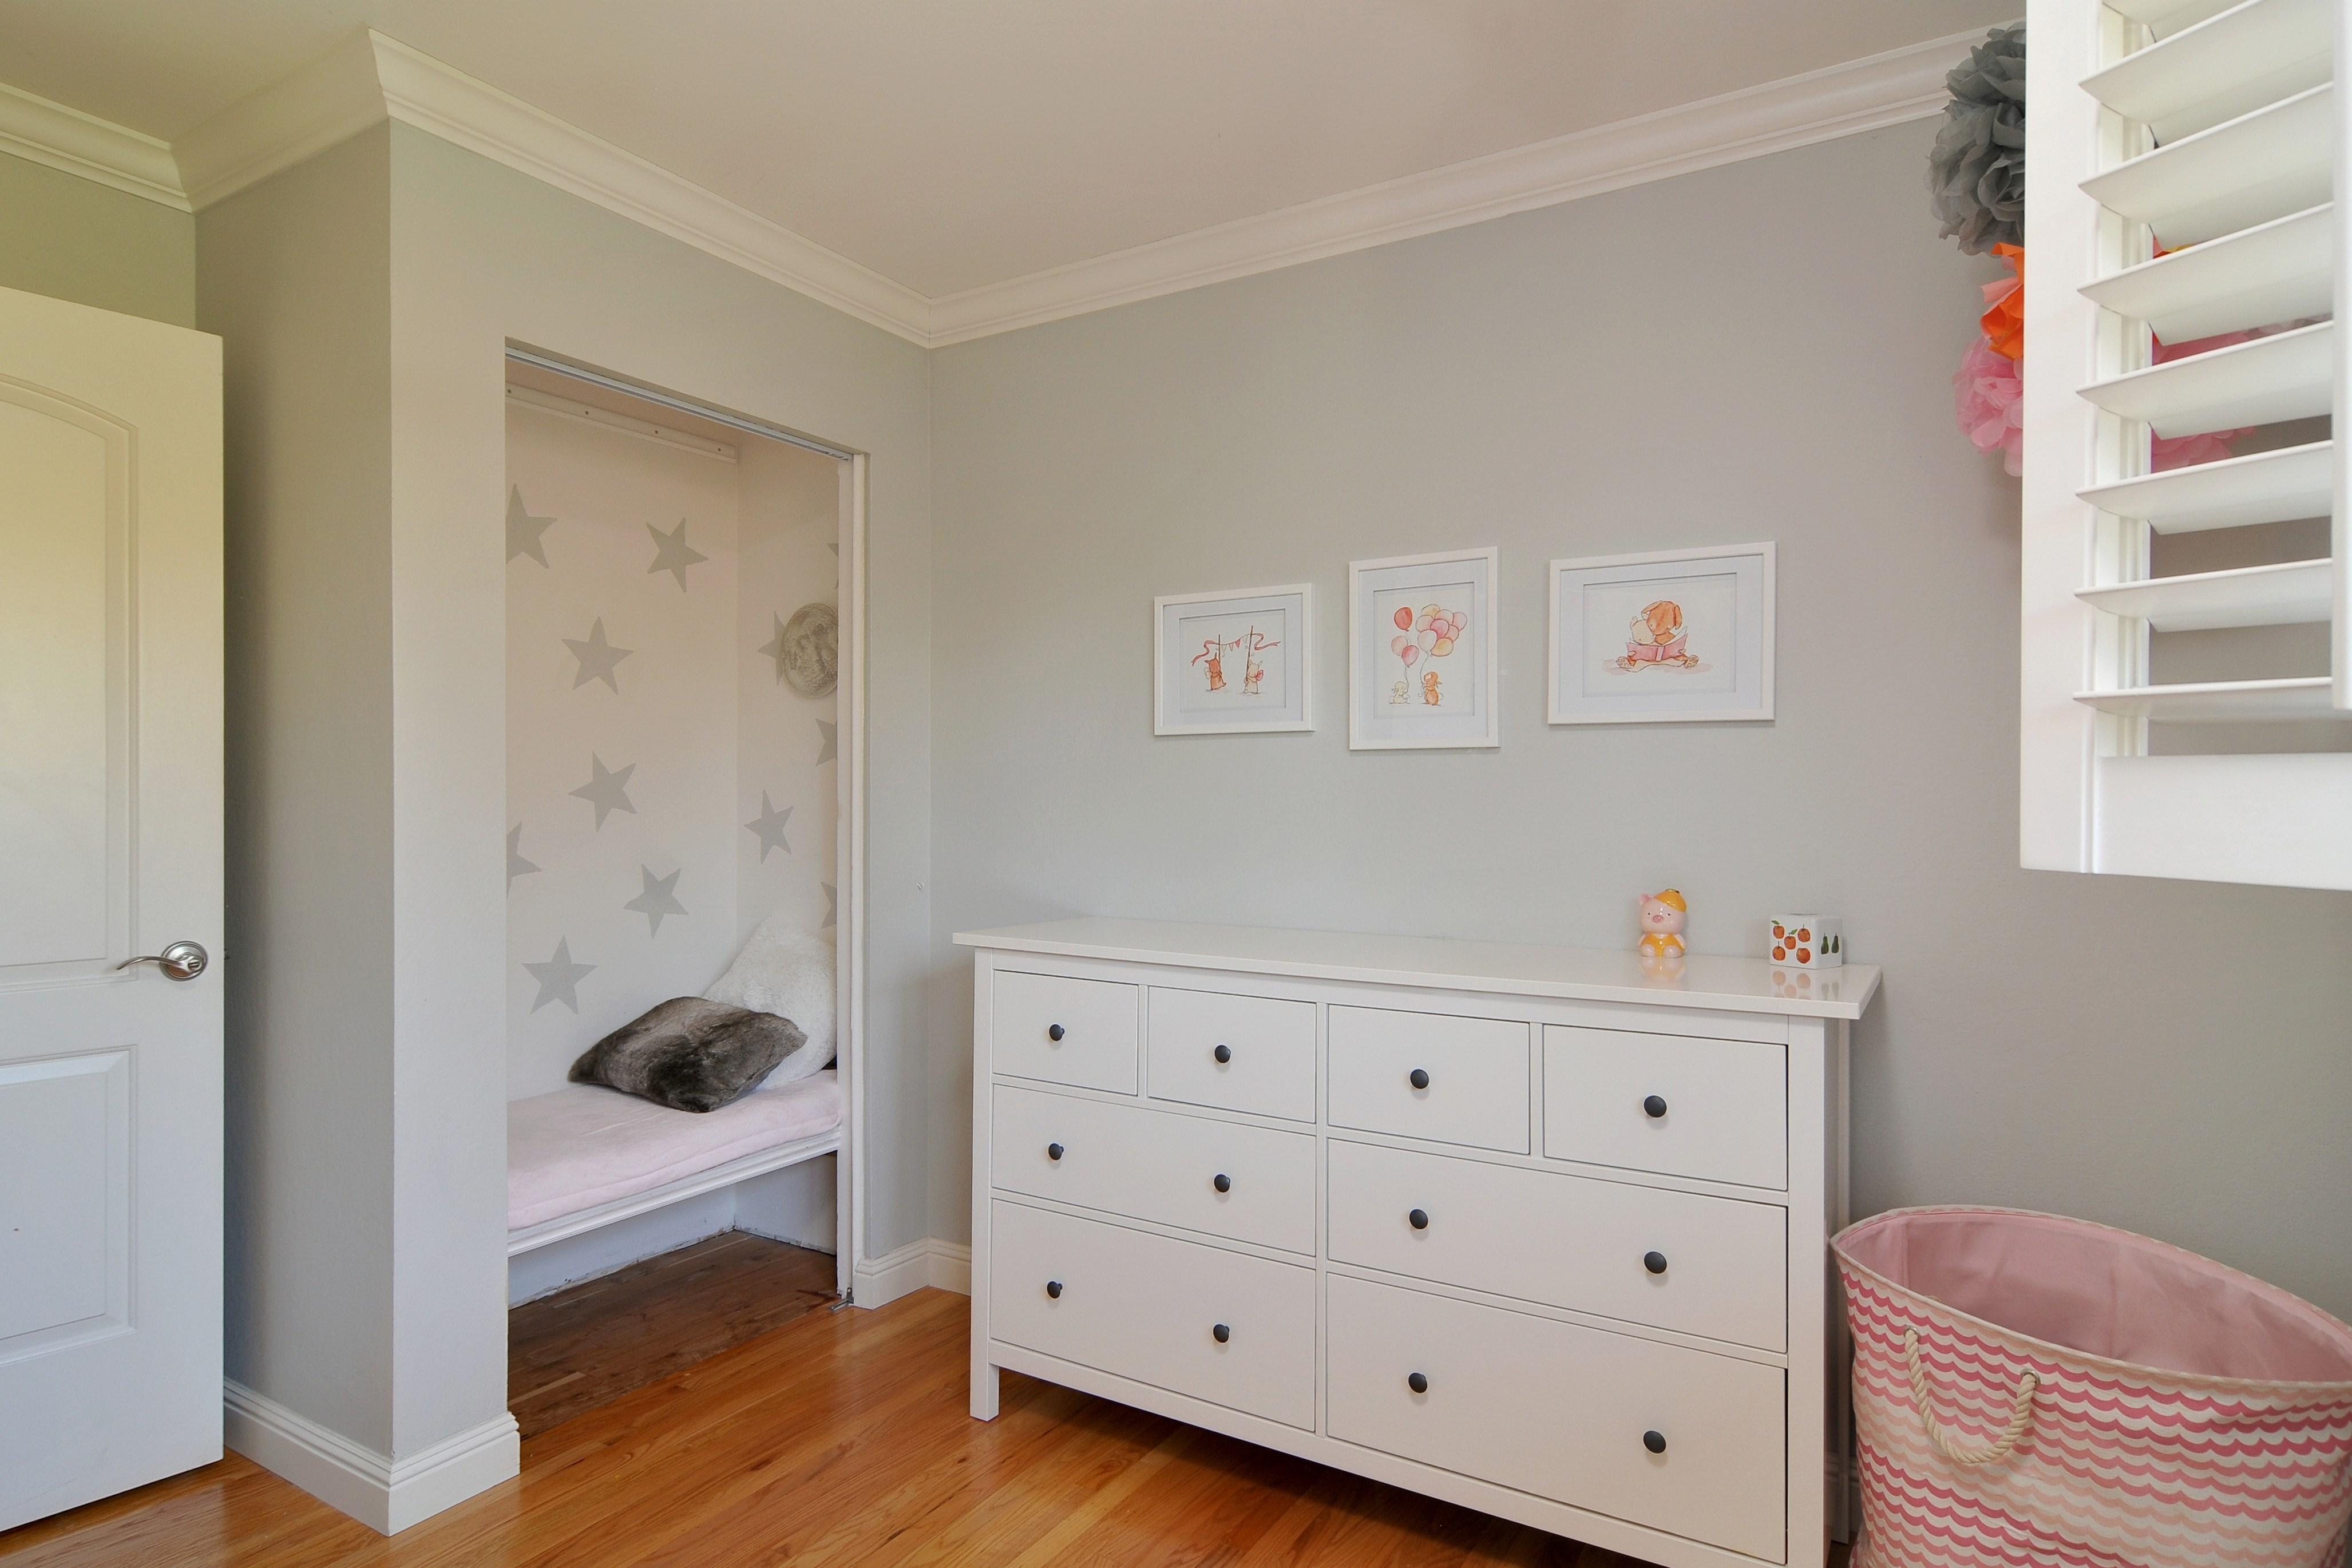 020 Bedroom 3 Nook - Exquisite, expansive, remodeled Belwood home - 127 Belhaven Drive, Los Gatos